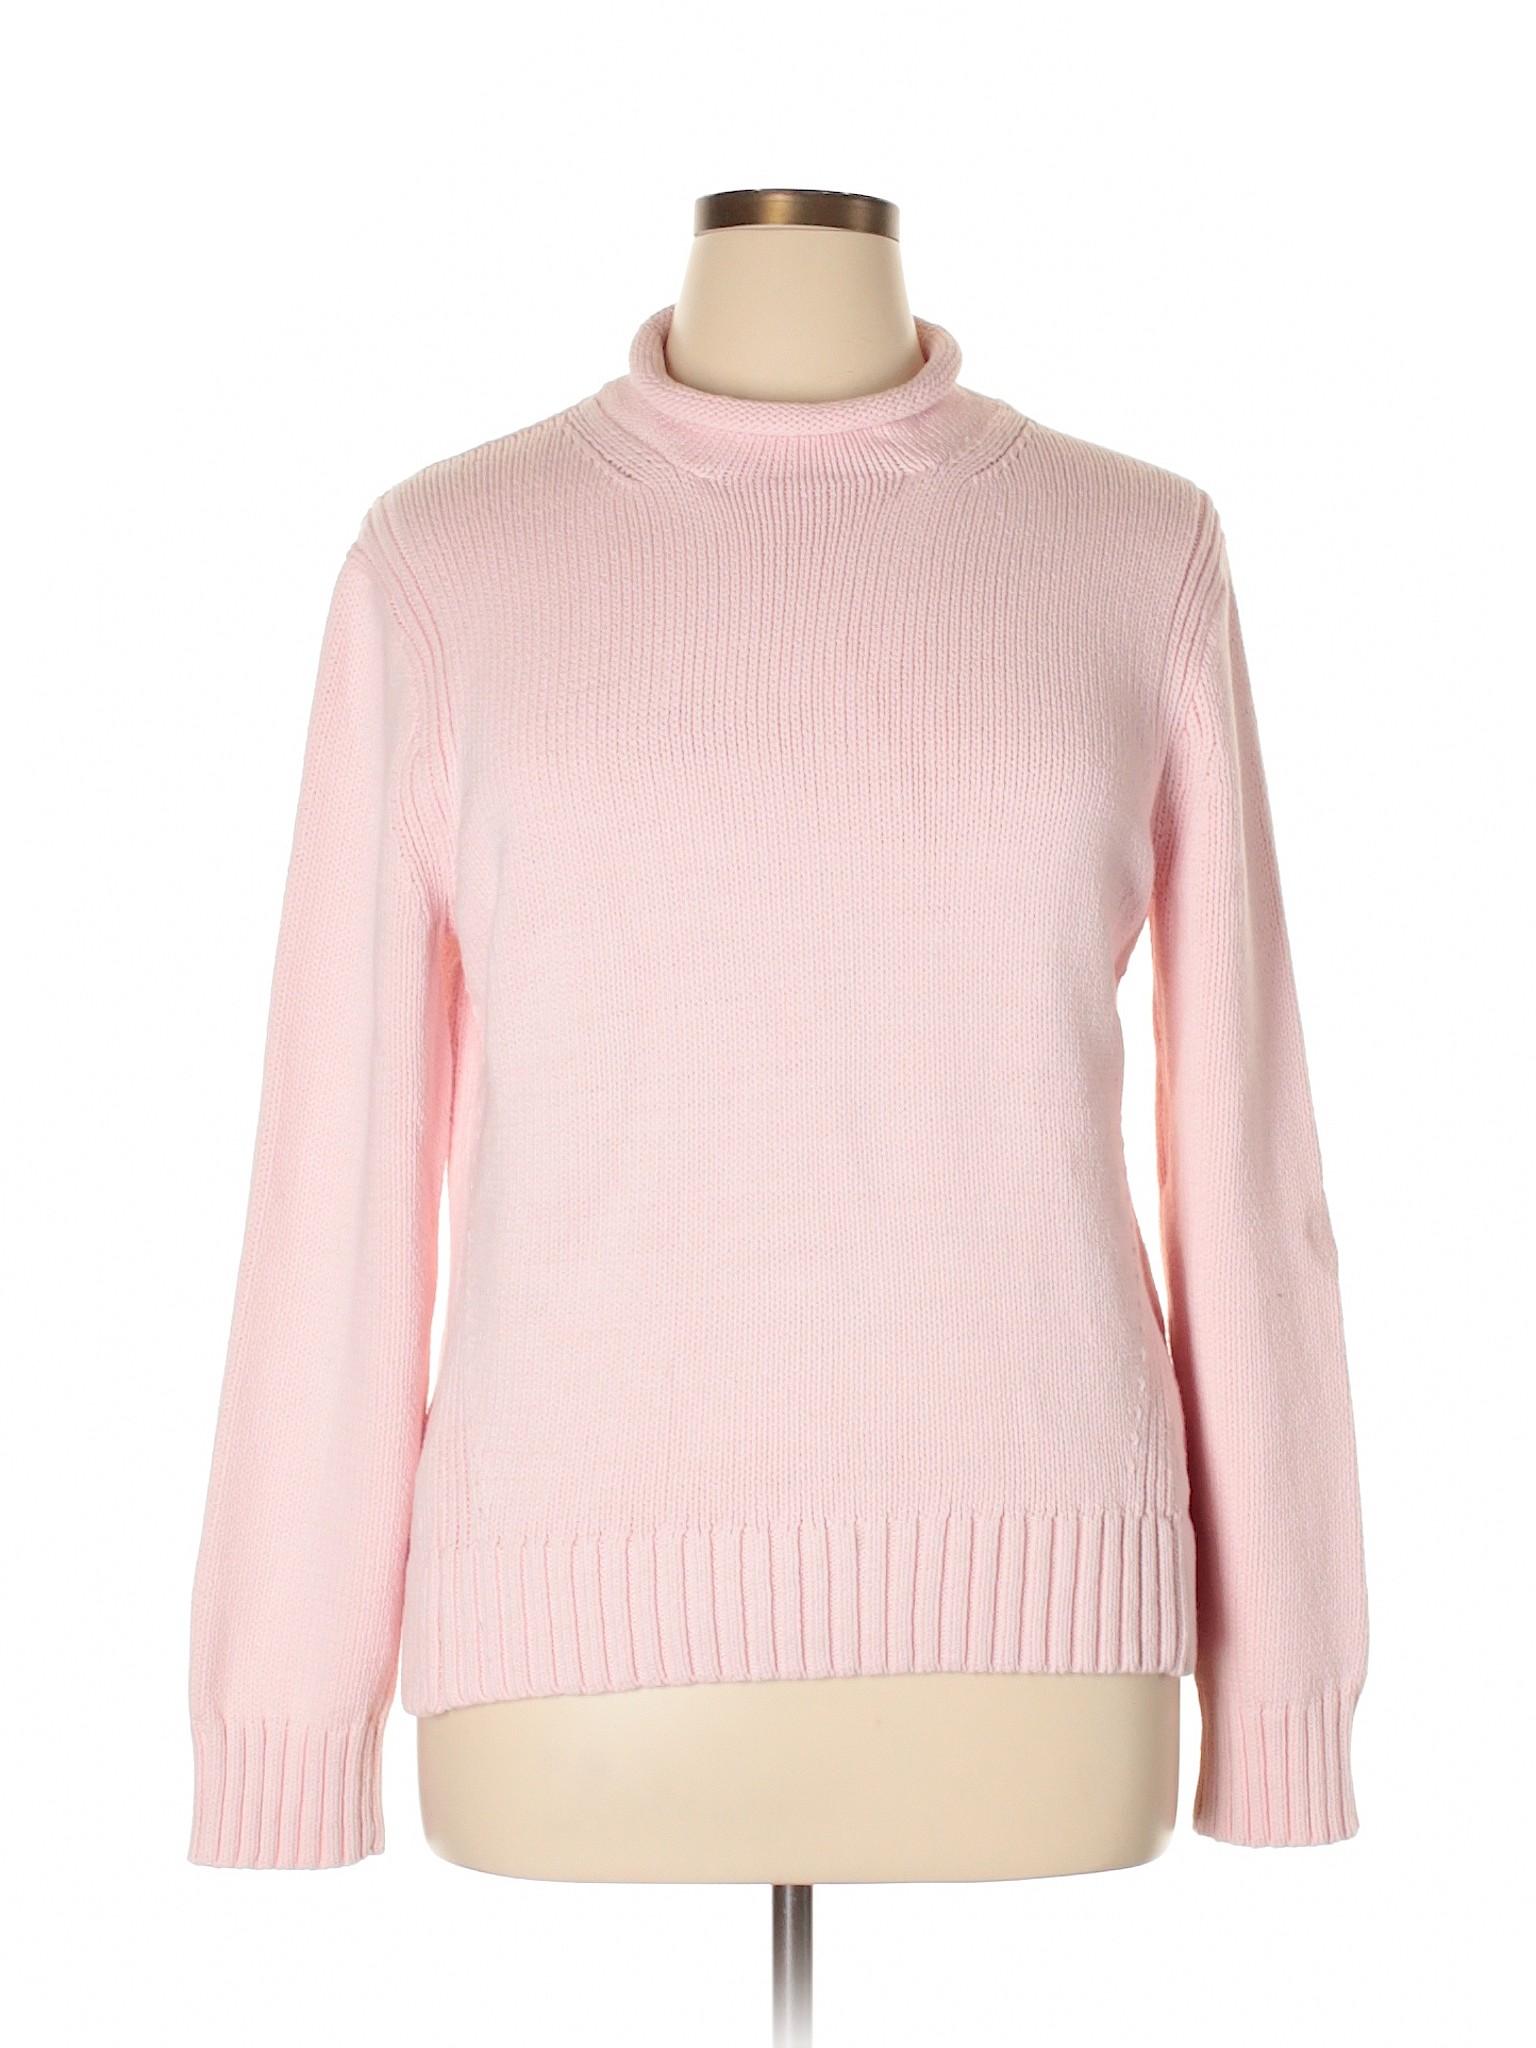 J Boutique Crew J Pullover Boutique Sweater HfvYq7fx